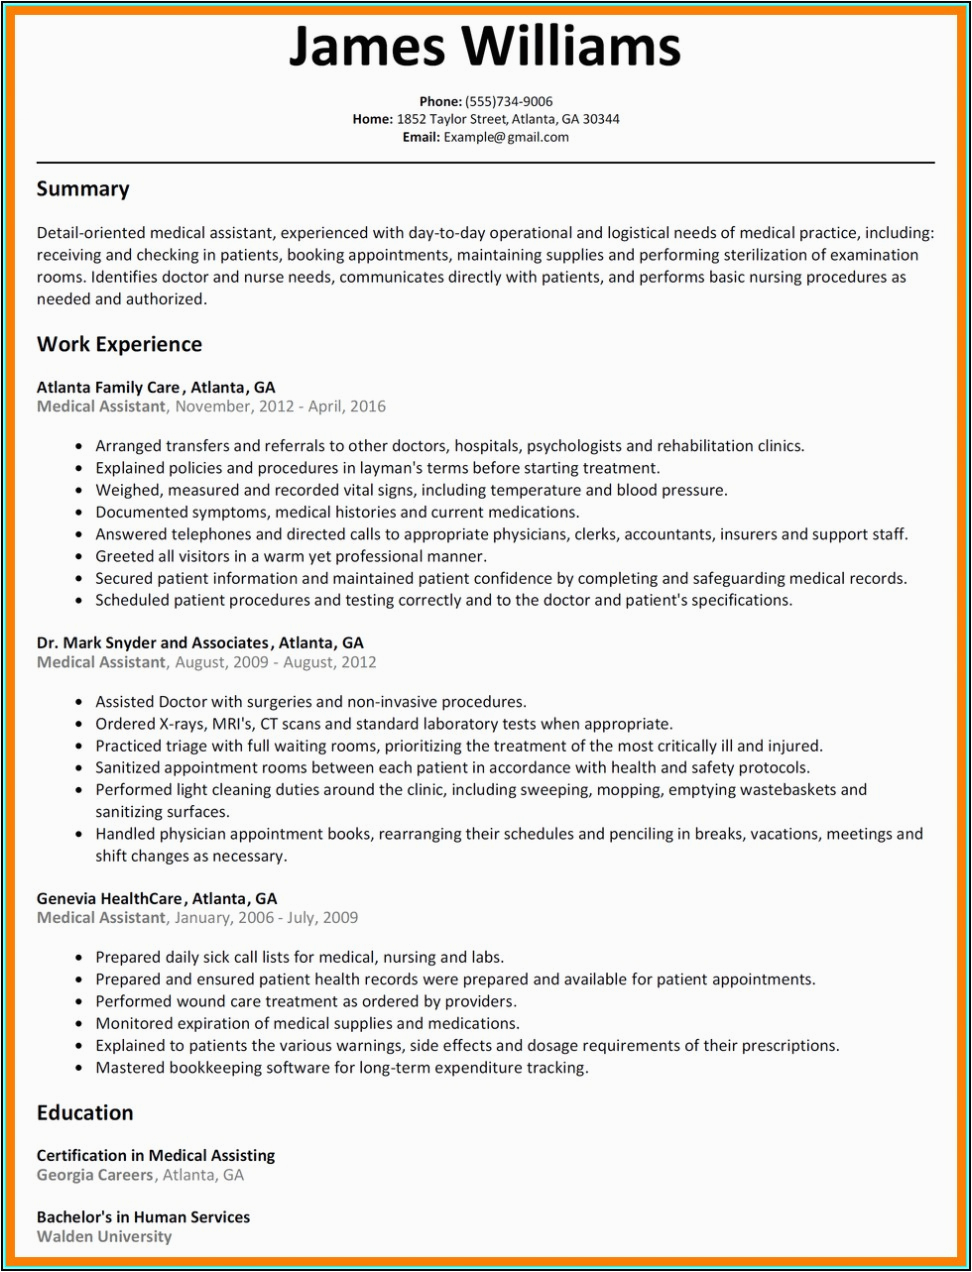 Sample Resume Objectives for Nursing Aide Sample Resume Objective for Nursing assistant Resume